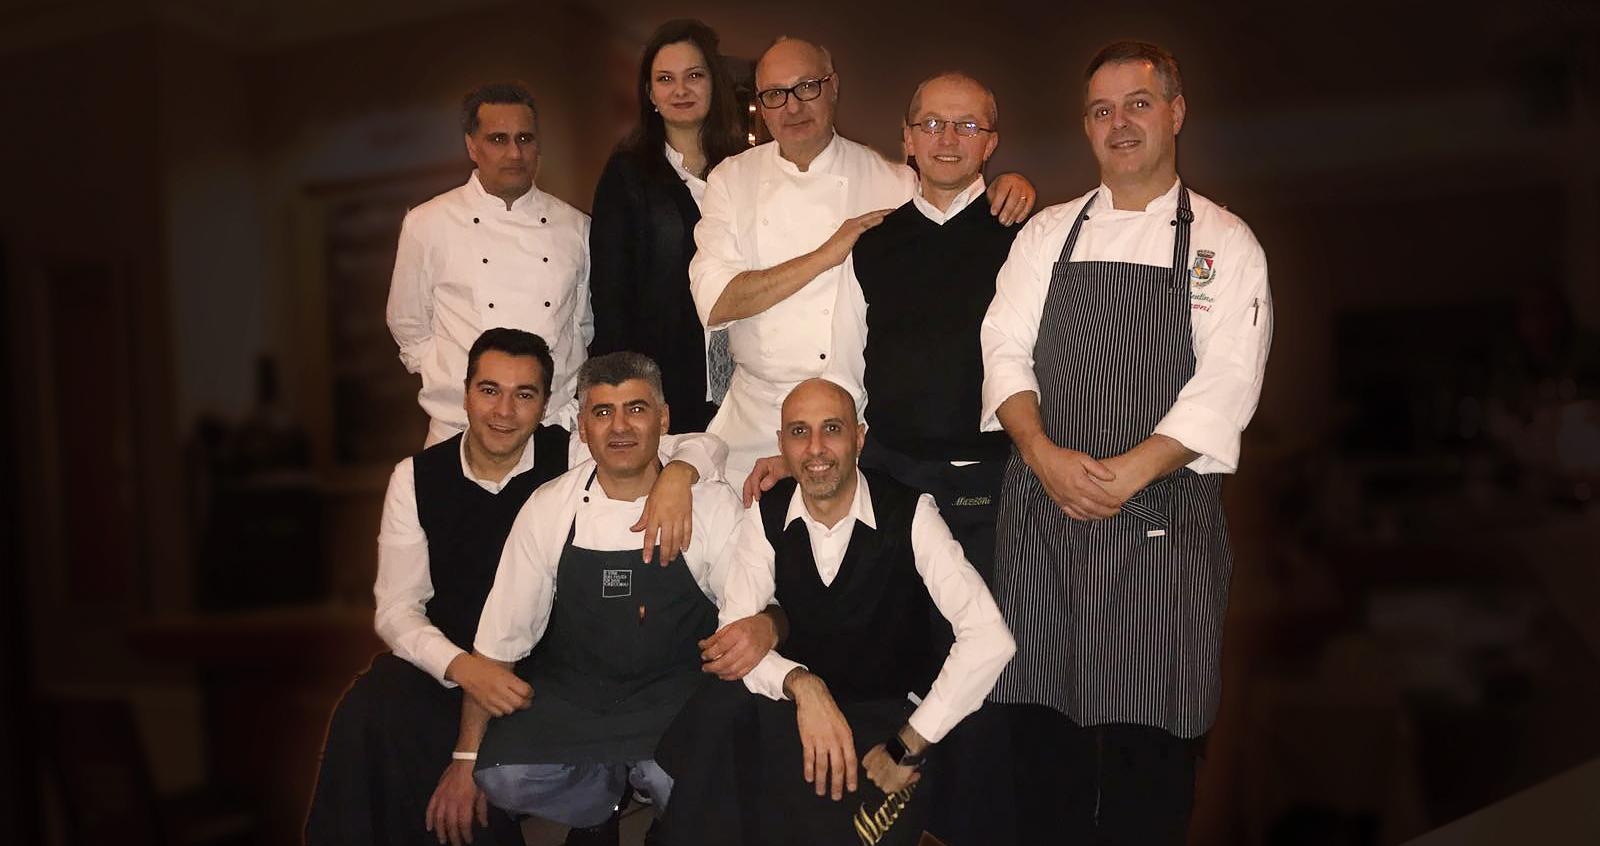 Mazzoni Cucina Italiana Team 2017